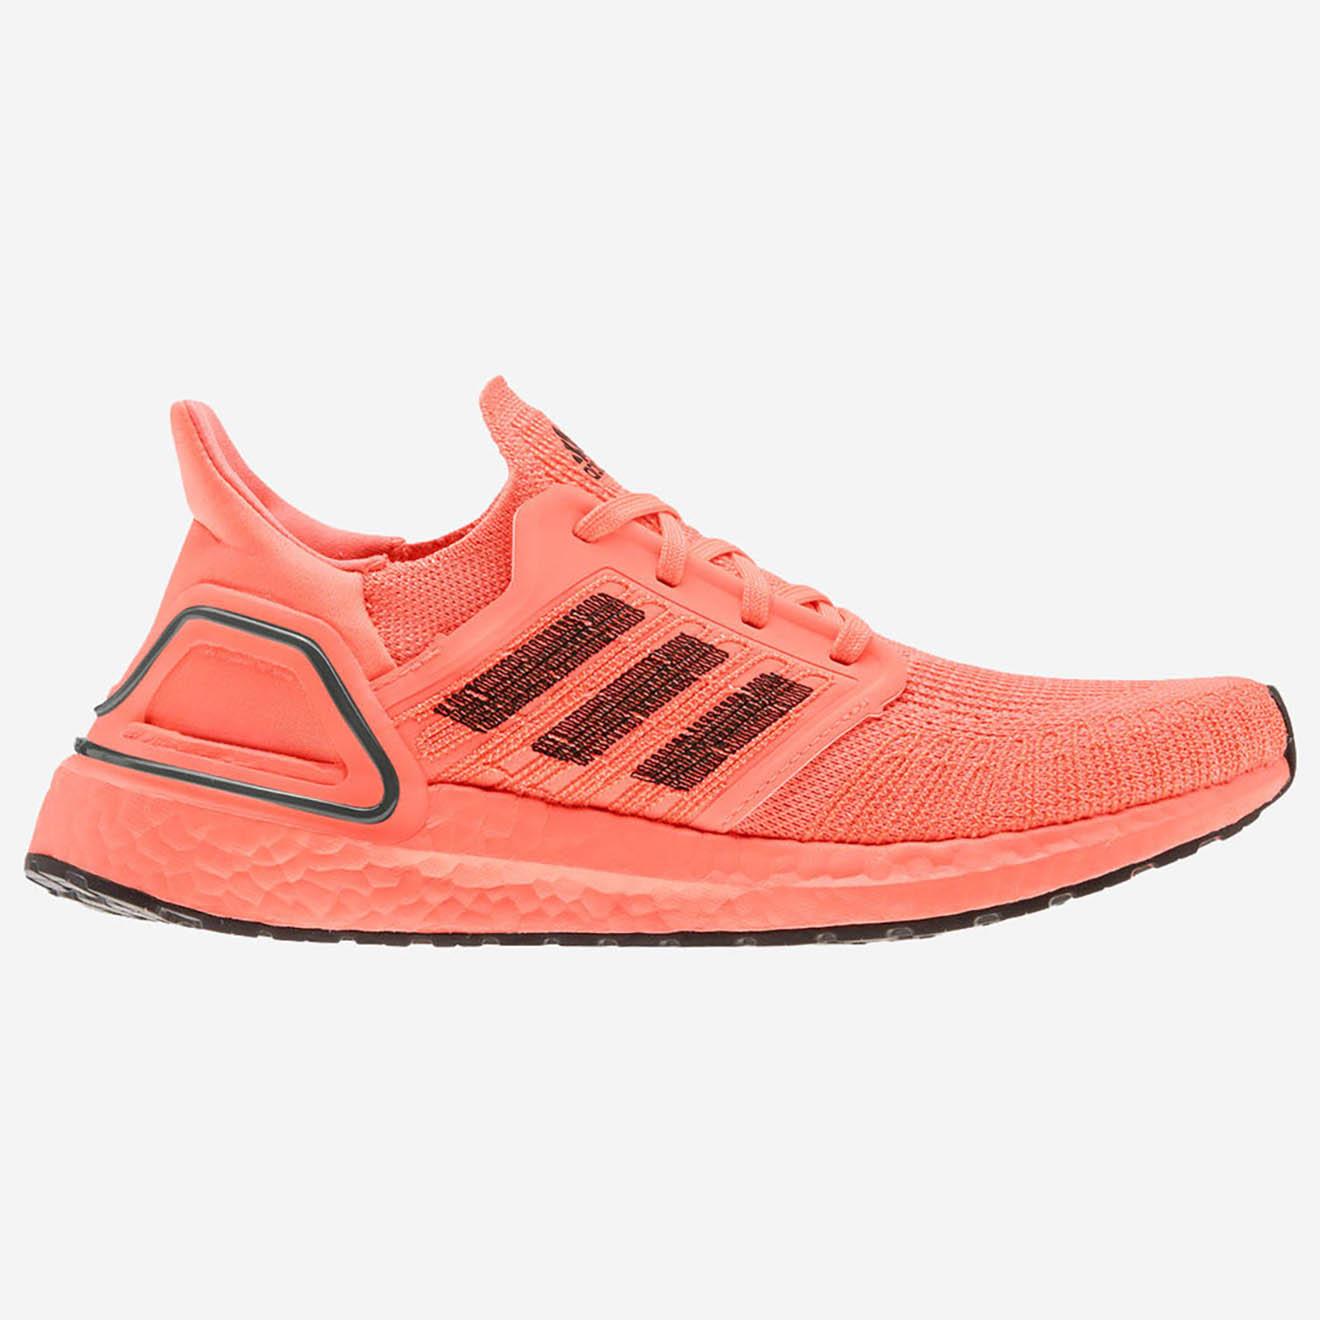 Baskets running Ultraboost 2 orange - Adidas - Modalova